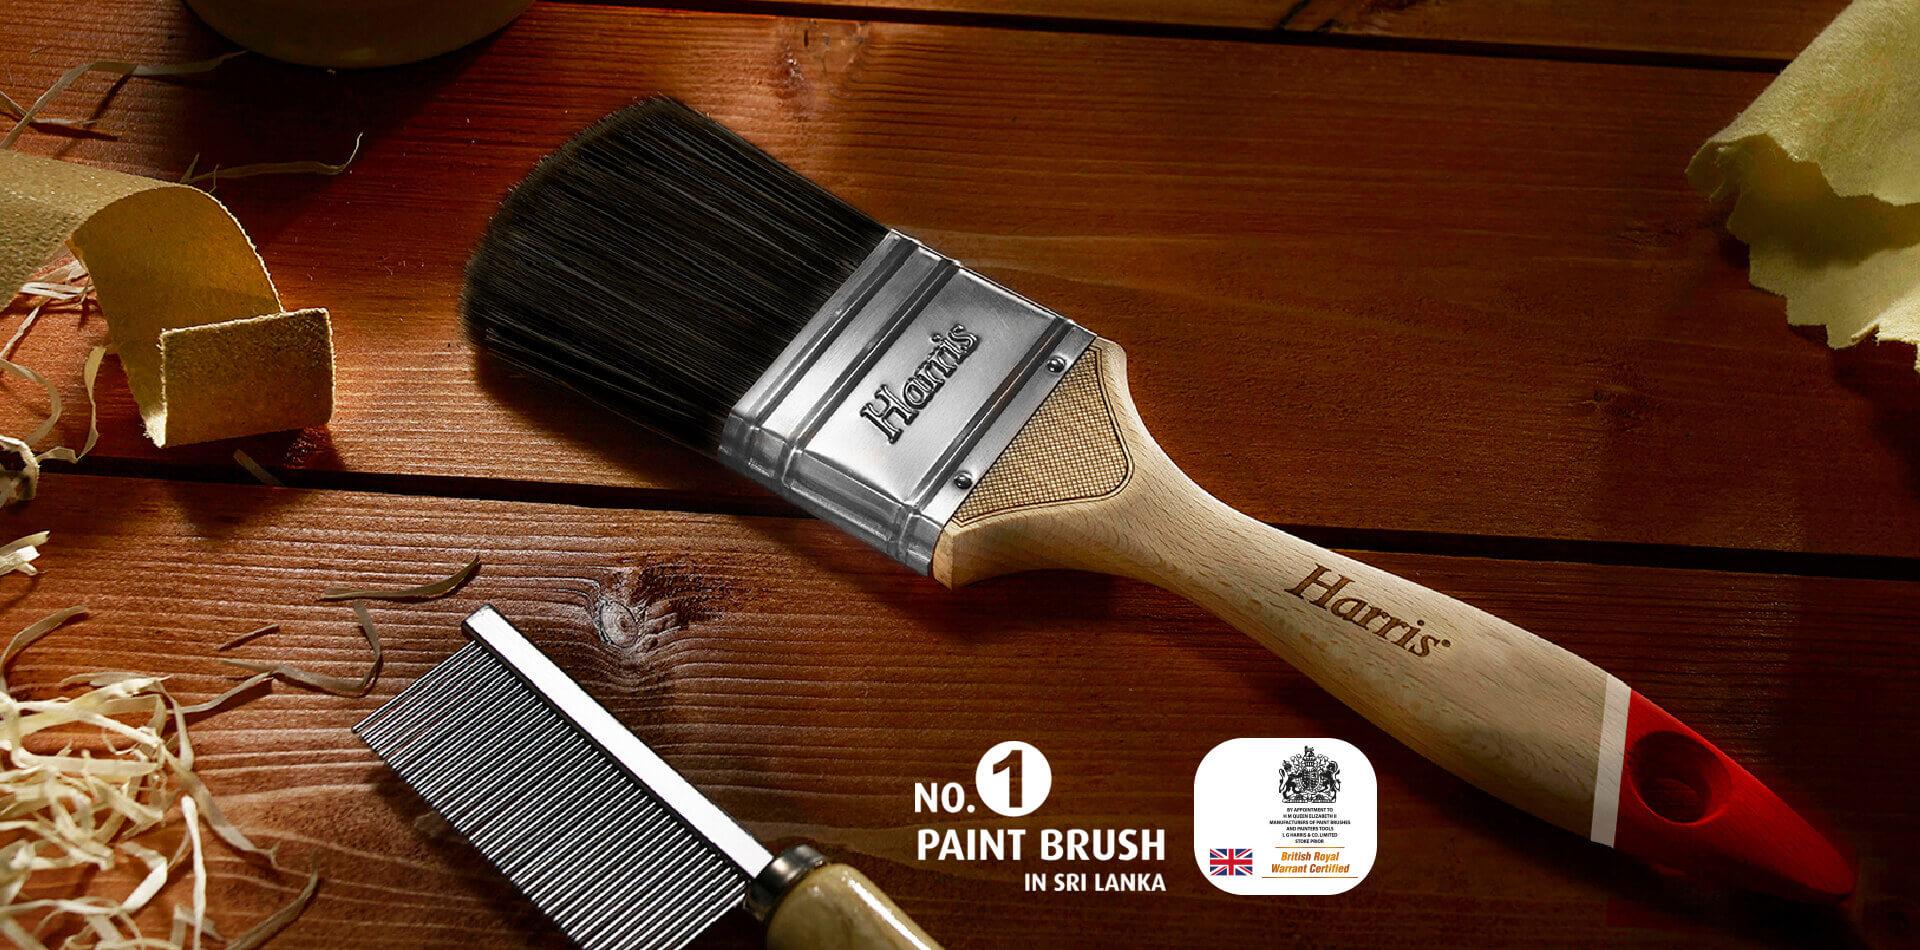 Harris quality paint brush number 1 paint brush in sri lanka